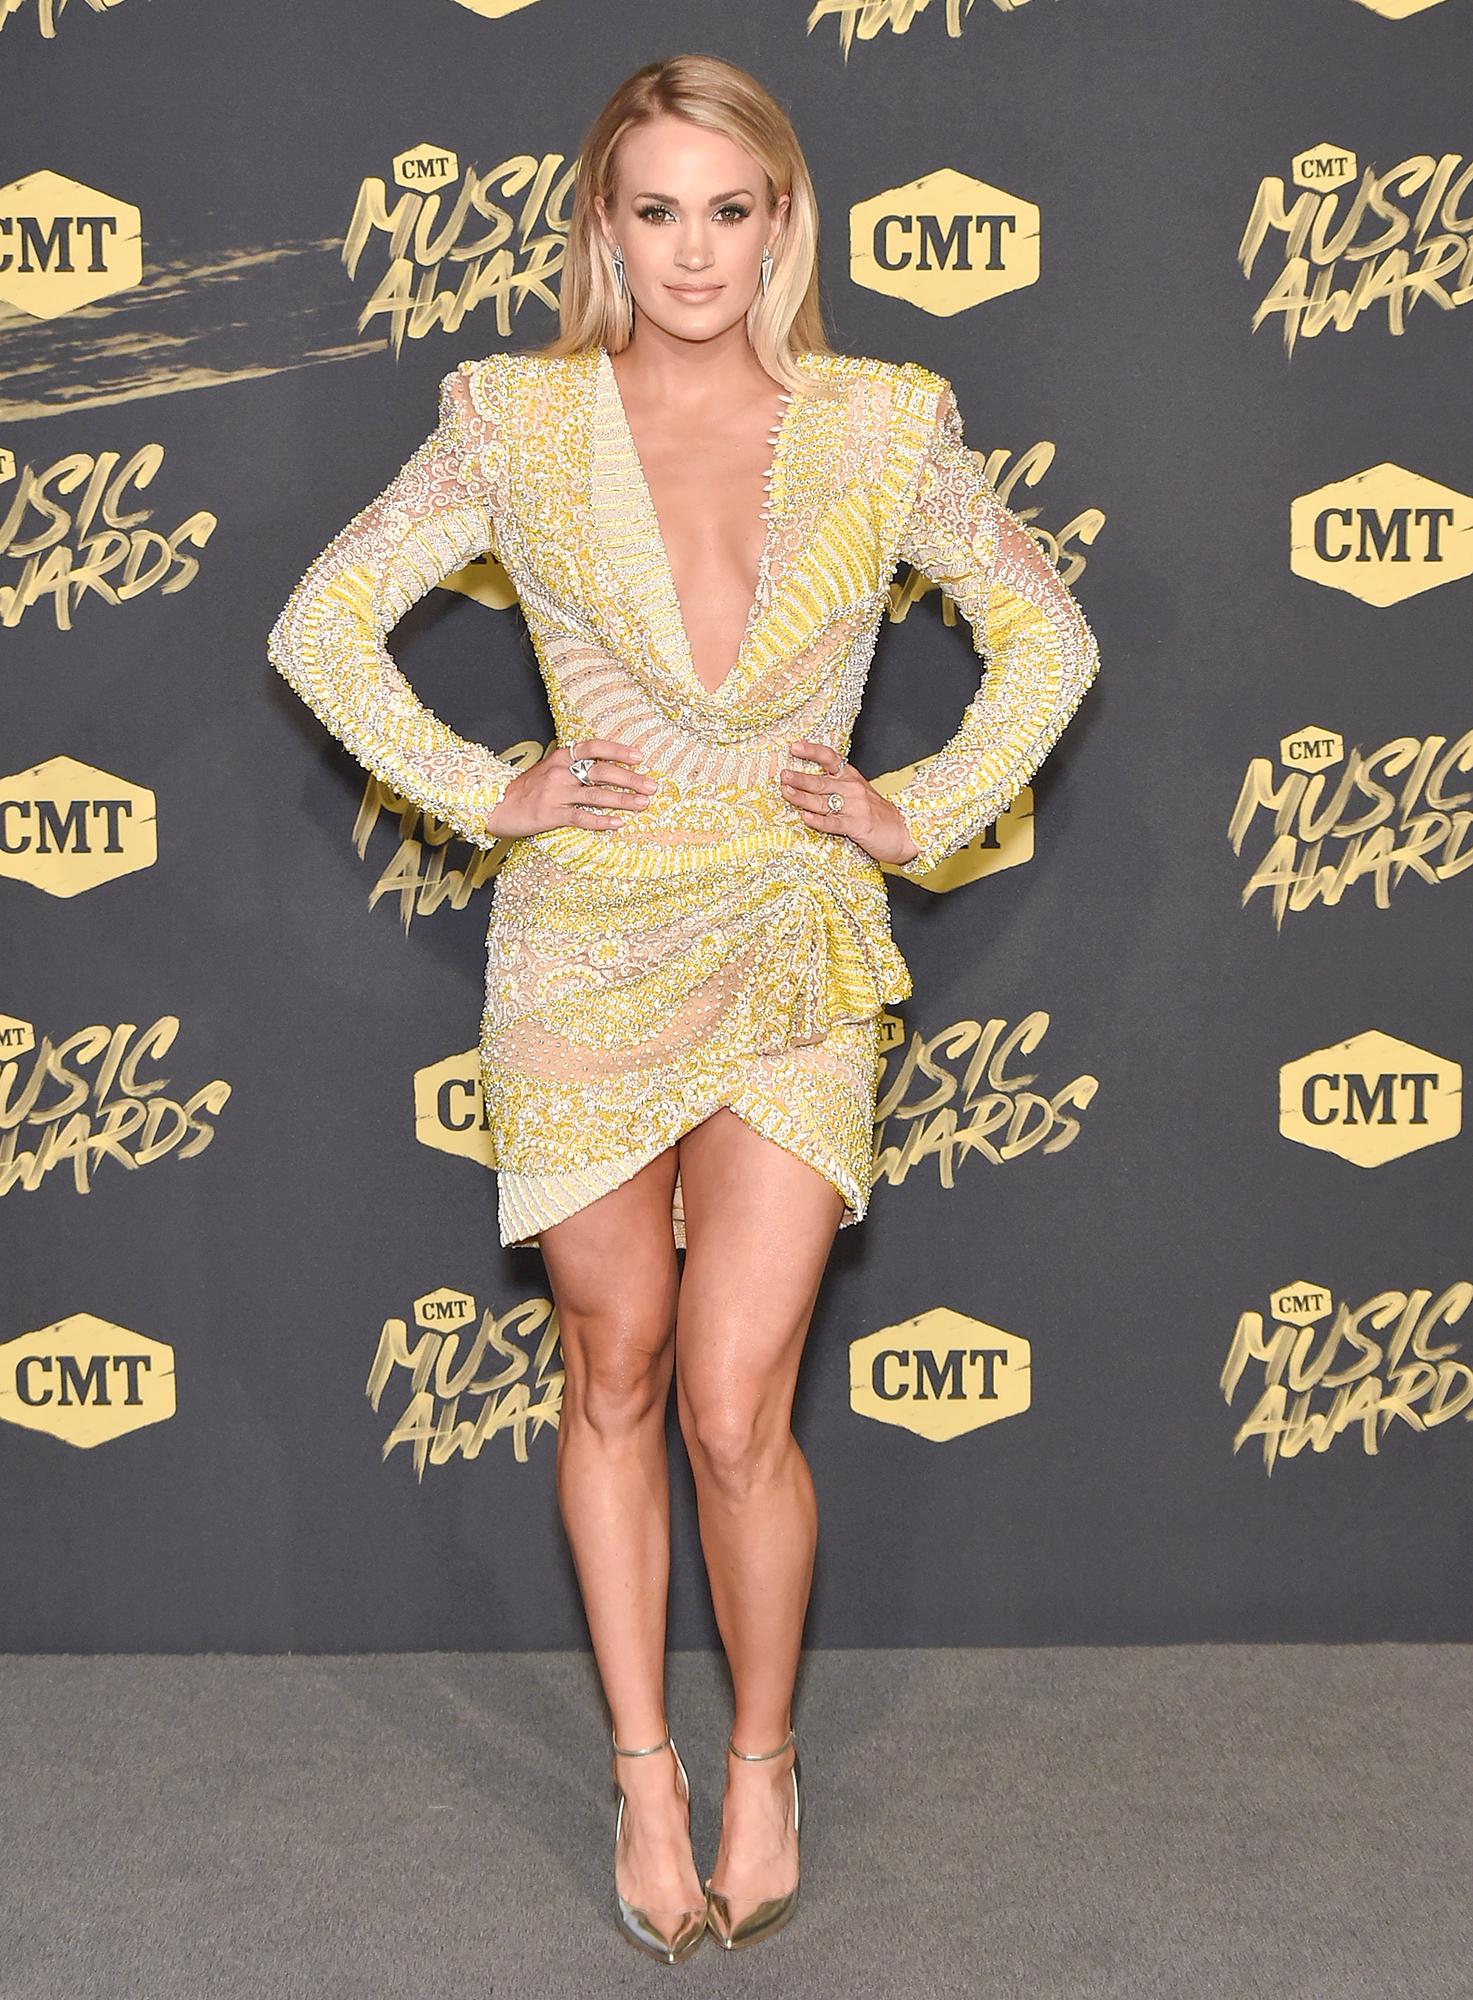 CMT Awards 2018 Arrivals, Celebrity Photos